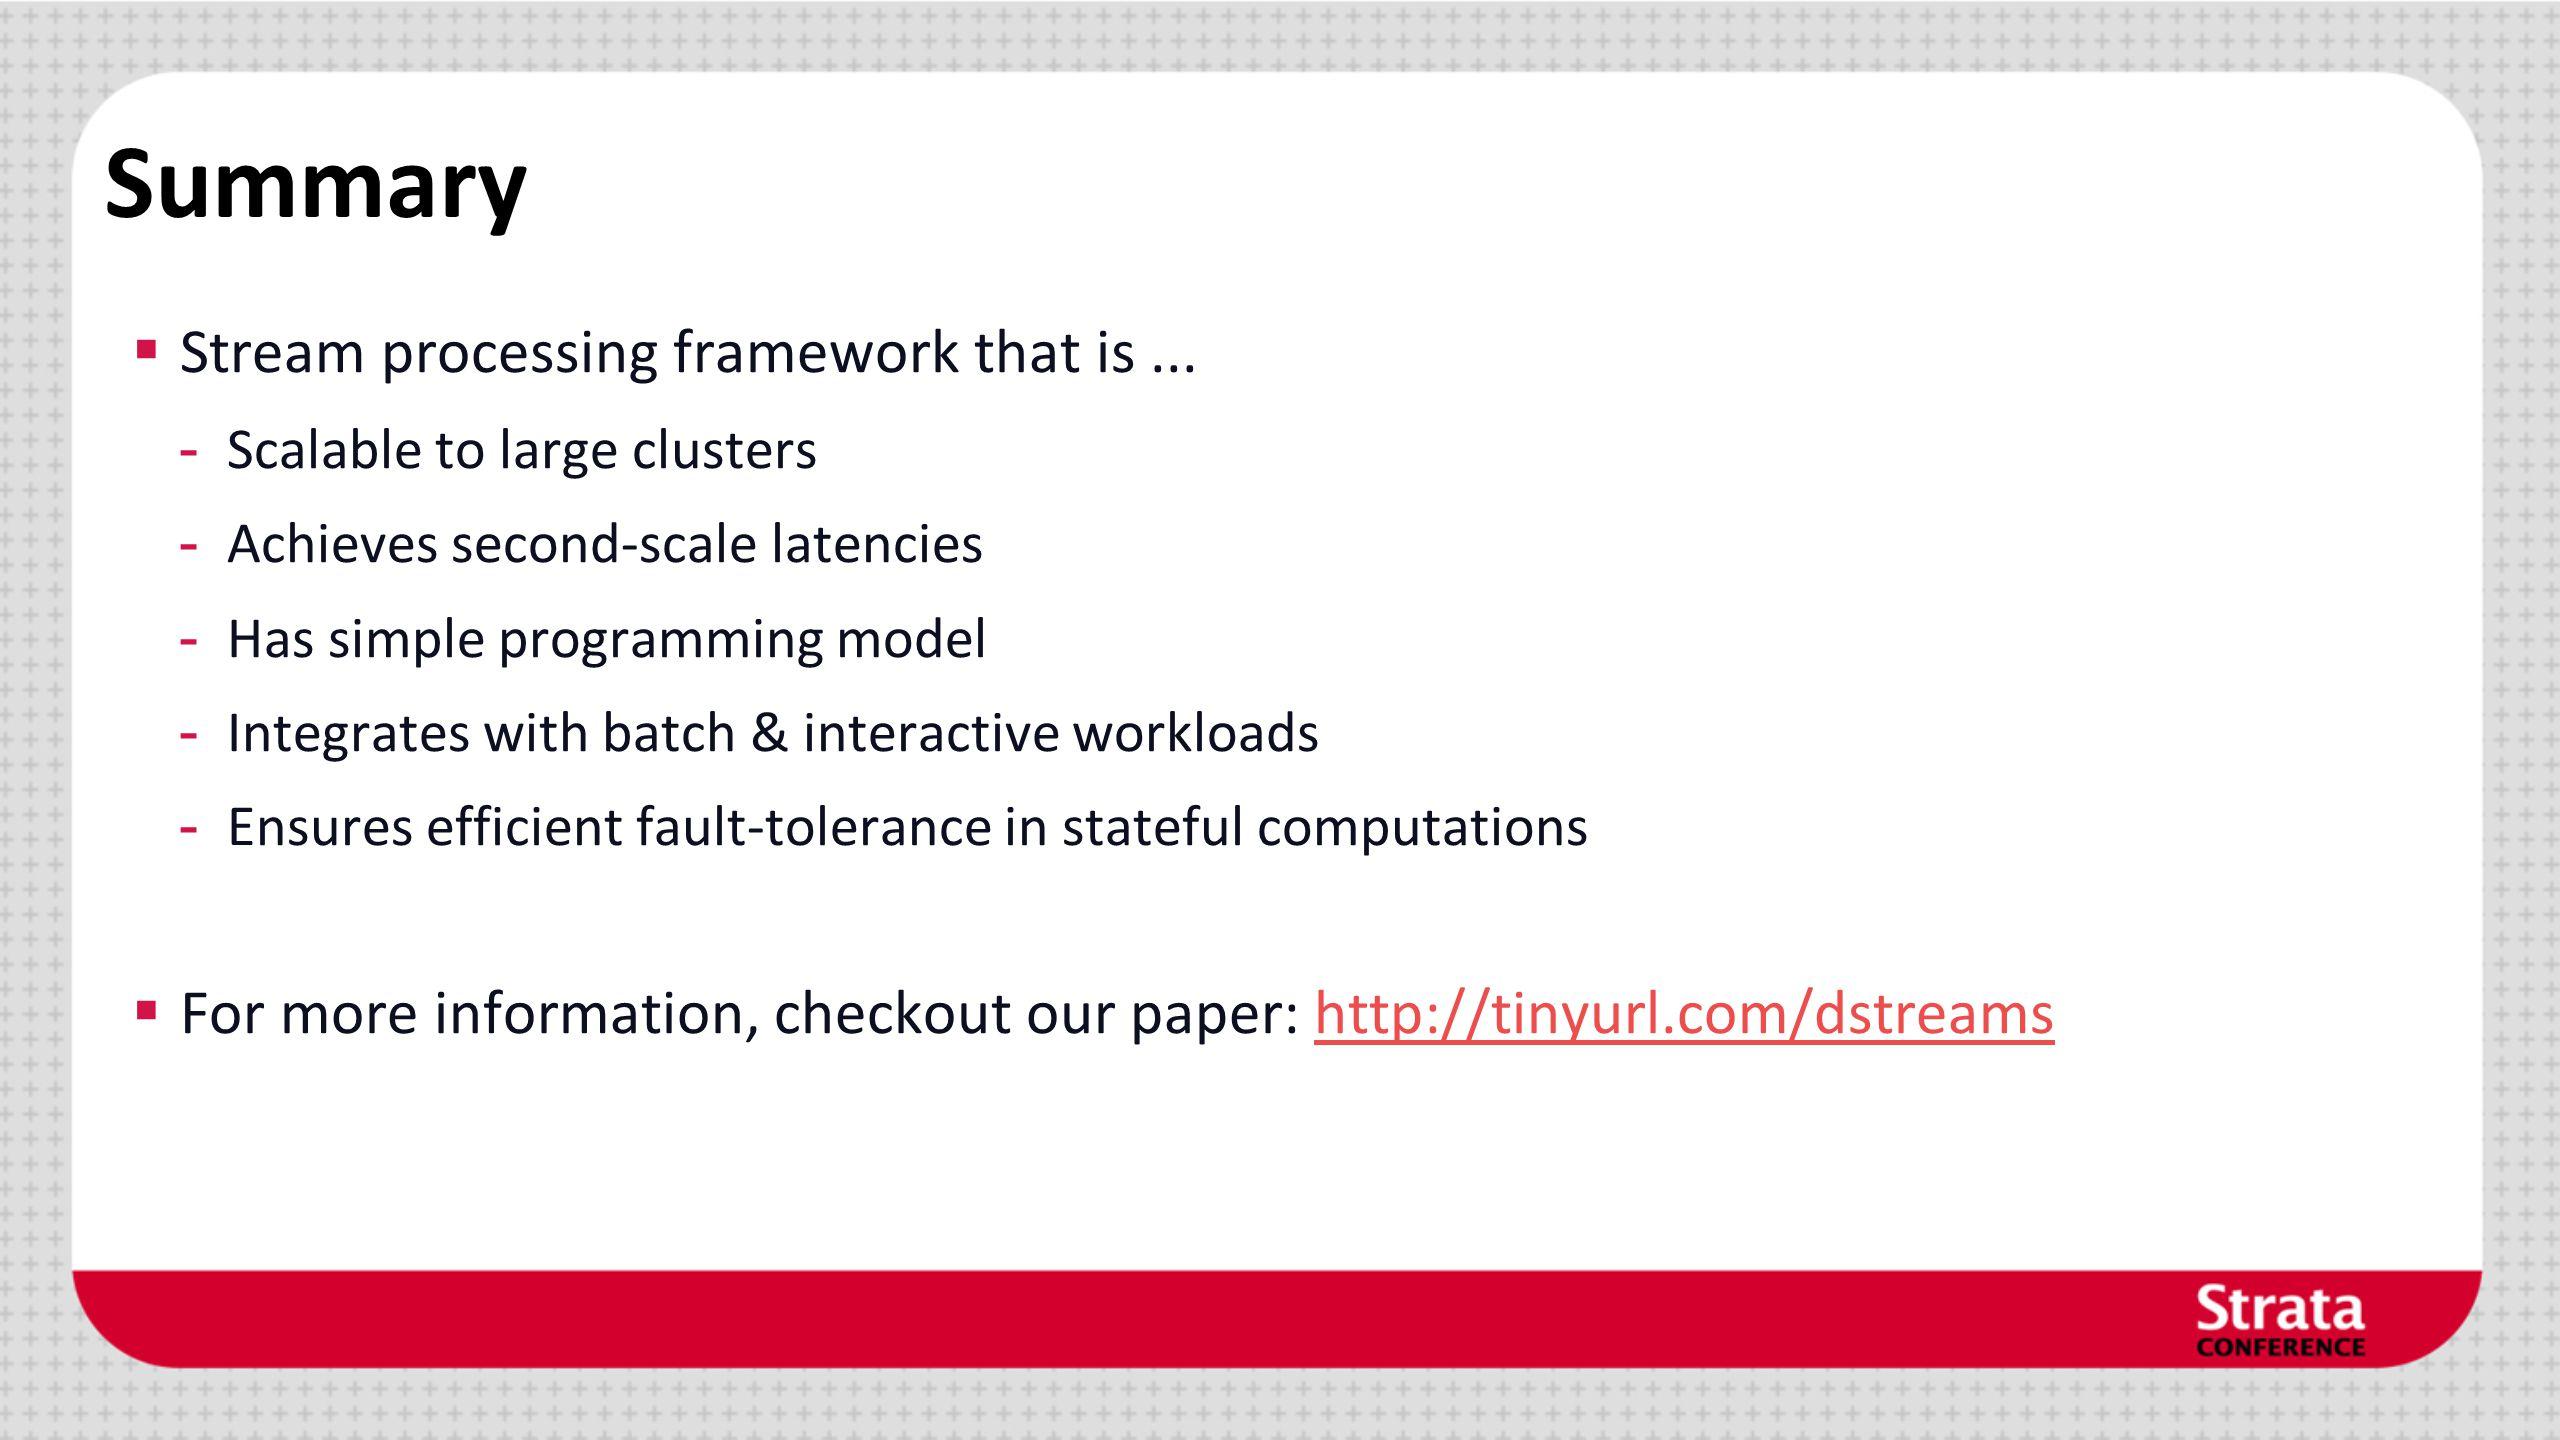 Summary Stream processing framework that is ...